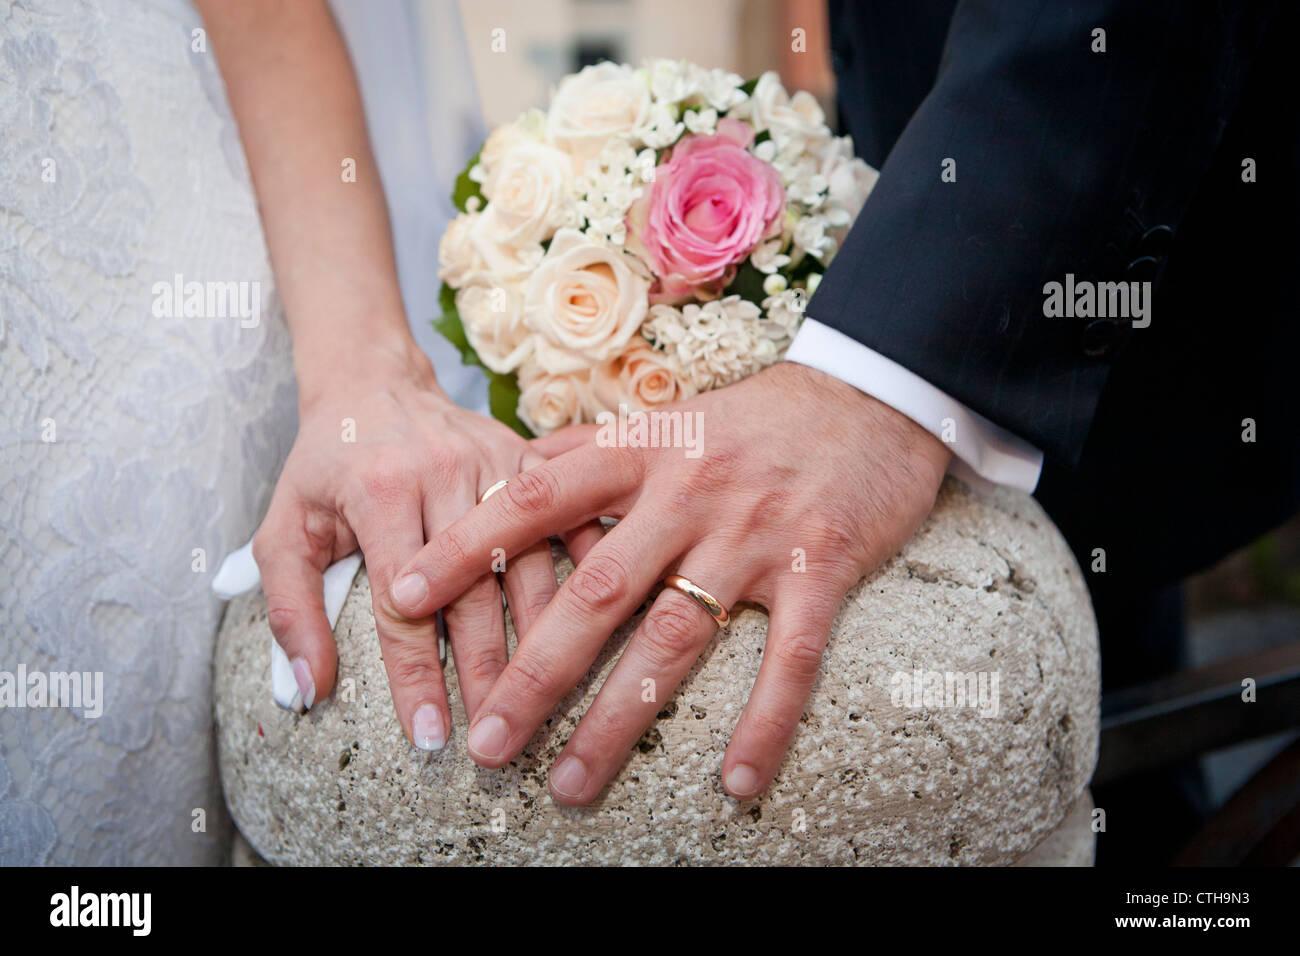 Wedding Bands Stock Photos & Wedding Bands Stock Images - Alamy